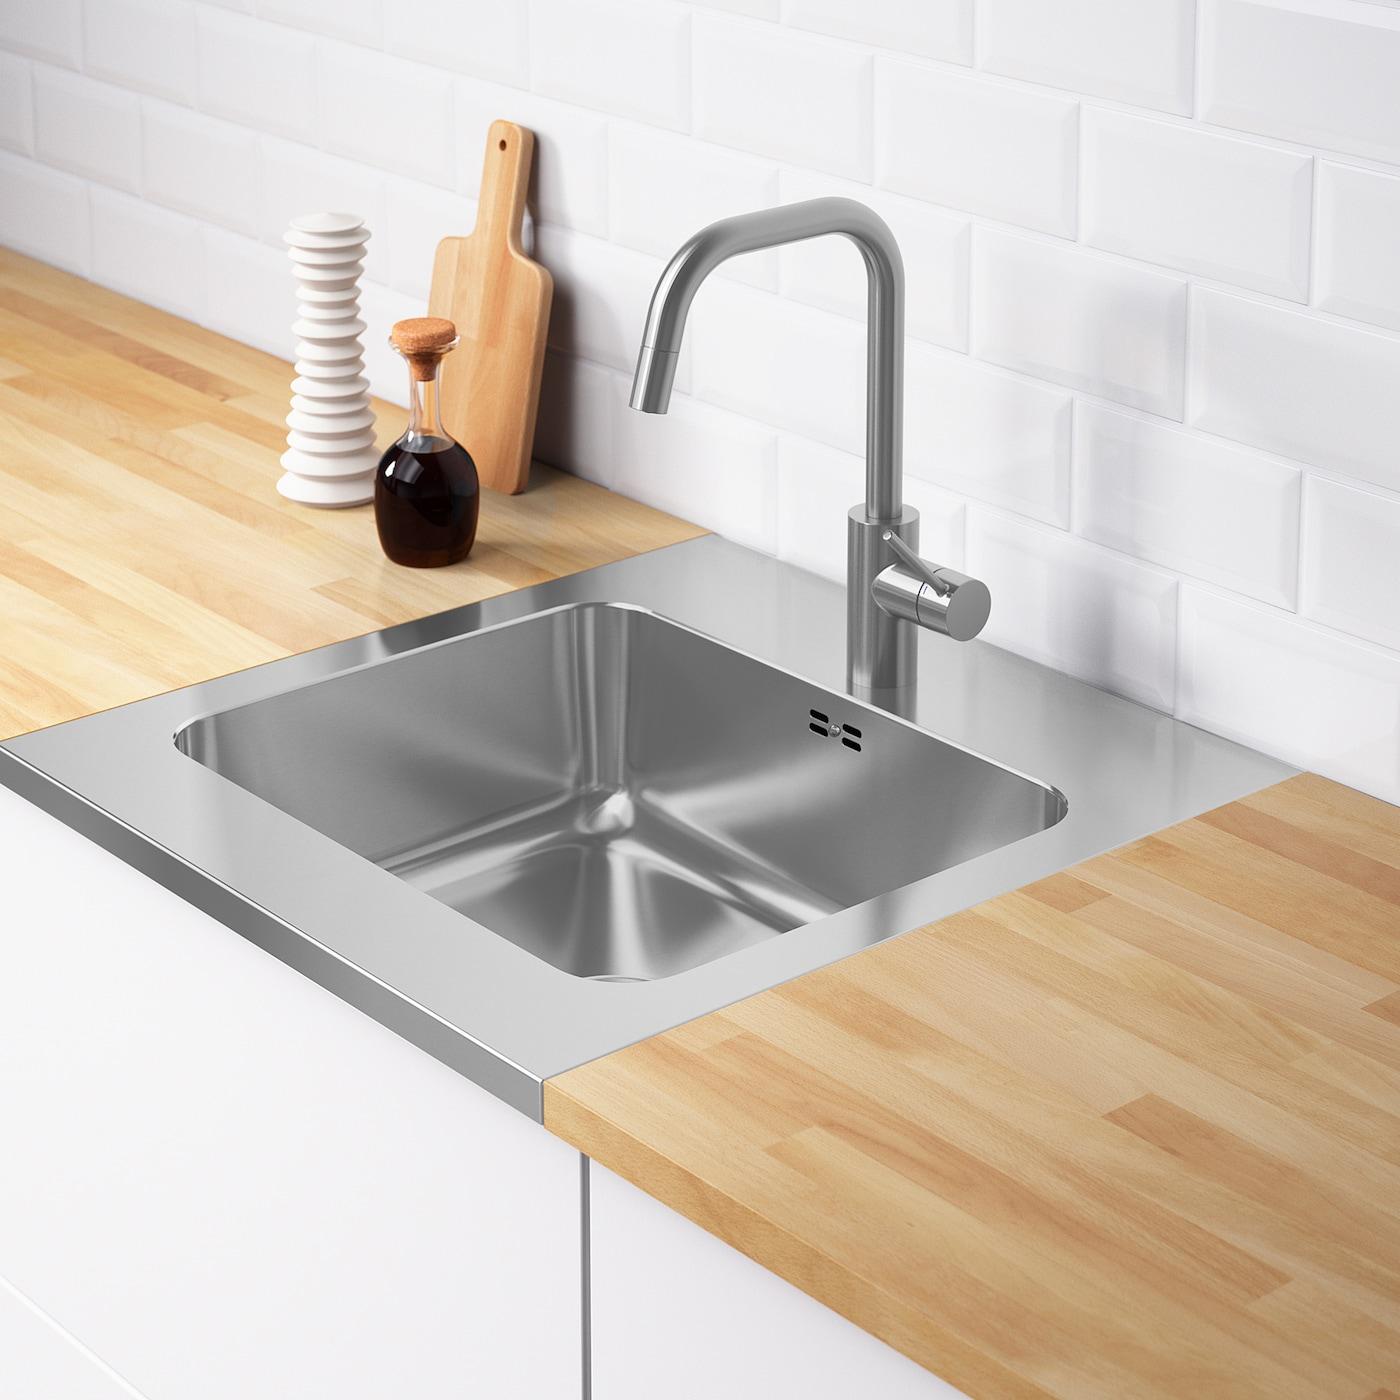 Ammeran Onset Sink 1 Bowl Stainless Steel Ikea Ireland